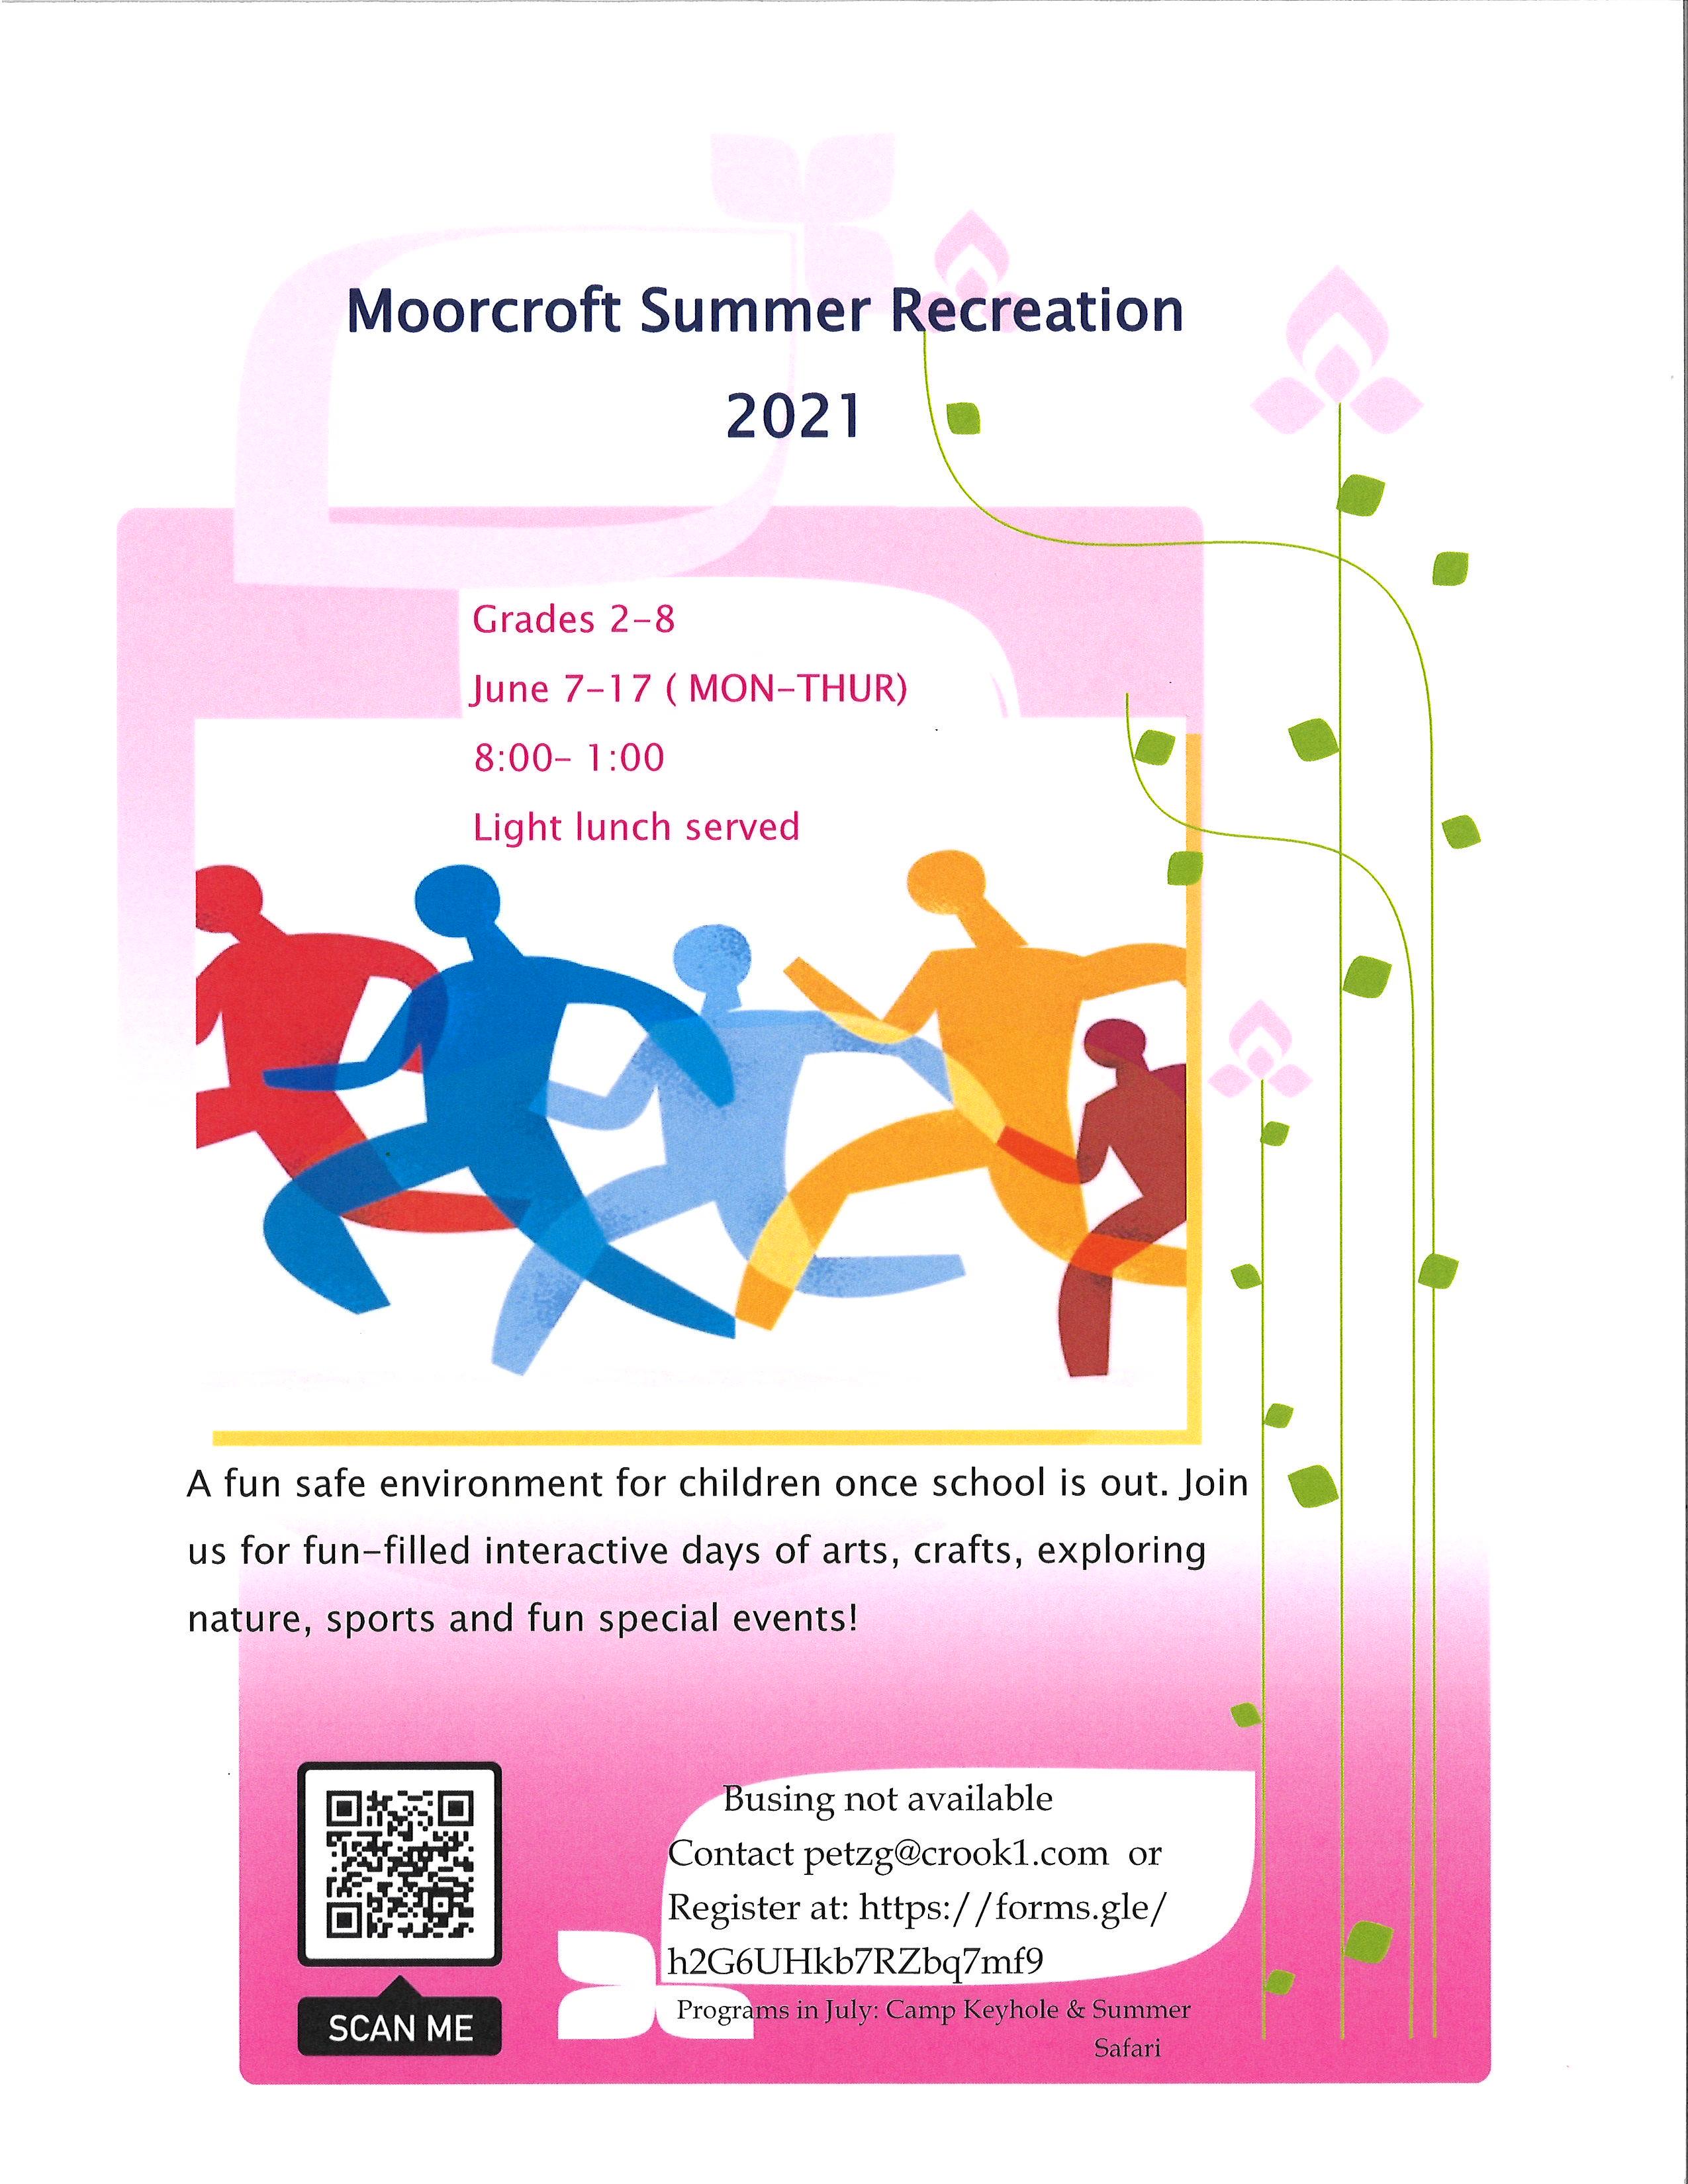 Summer Recreation Program June 7-17 open to grades 2-8